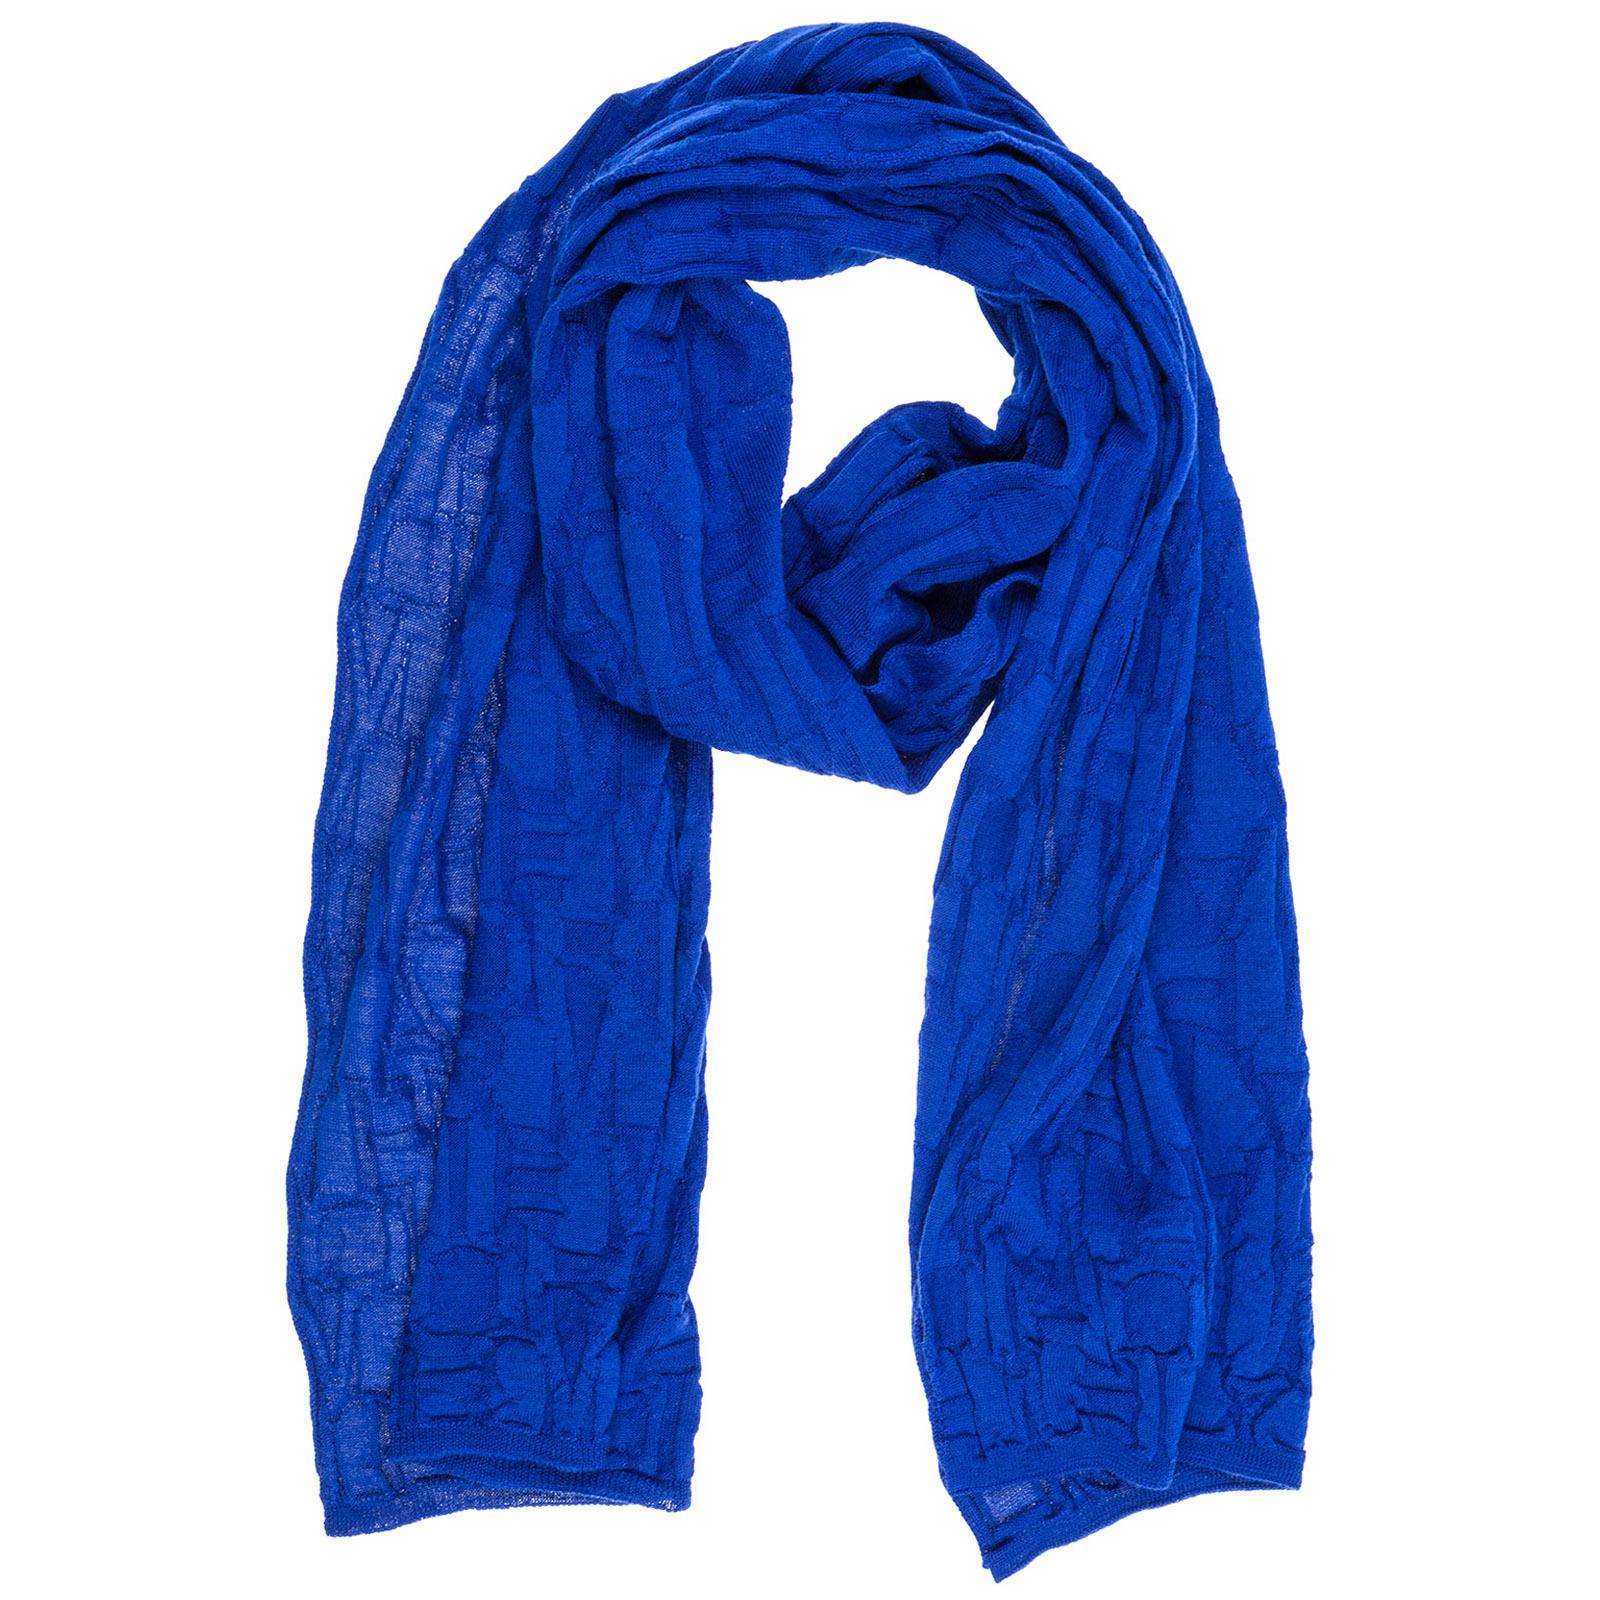 Écharpe en laine Emporio Armani 6Z14071MA5Z0952 bluette   FRMODA.com 0ec186be643